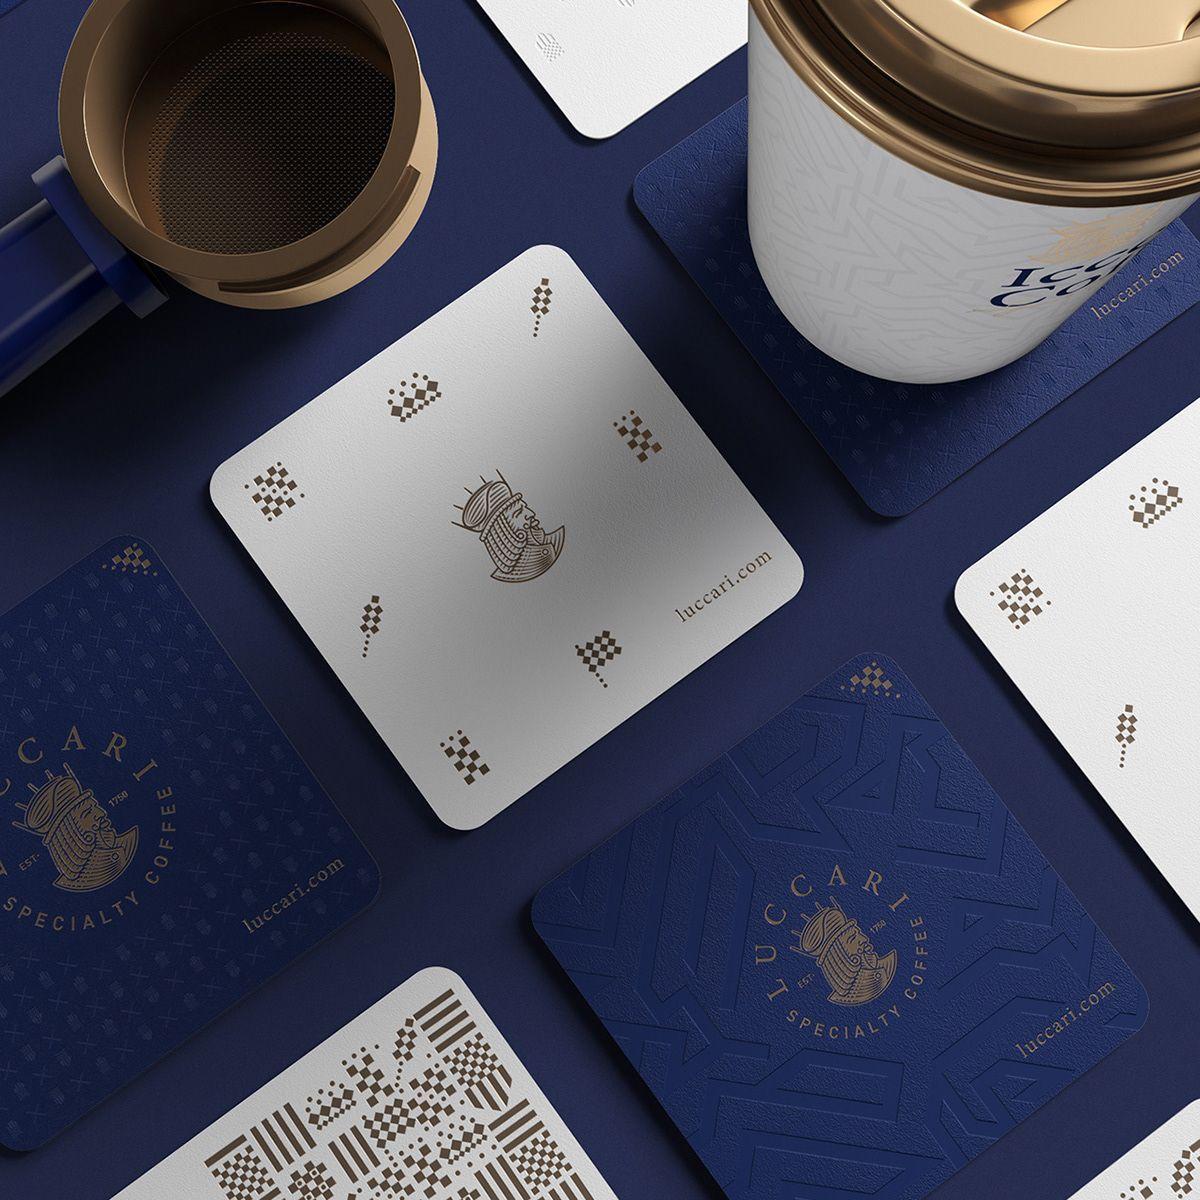 Pin by Manvydas Kūgis on GRAPHIC / PRINT / LOGOS Coffee